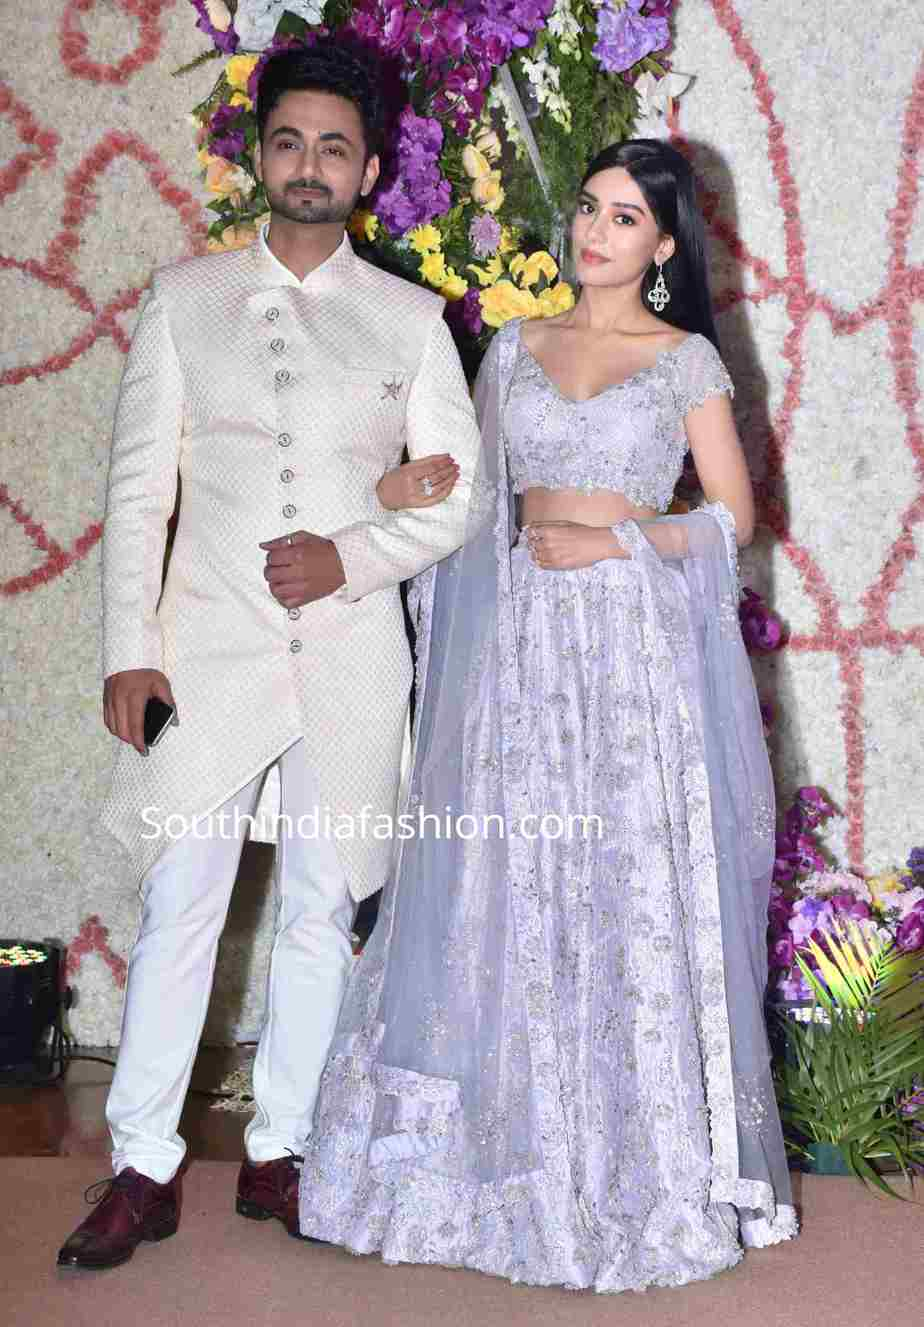 amrita rao with husband at a wedding reception (2)